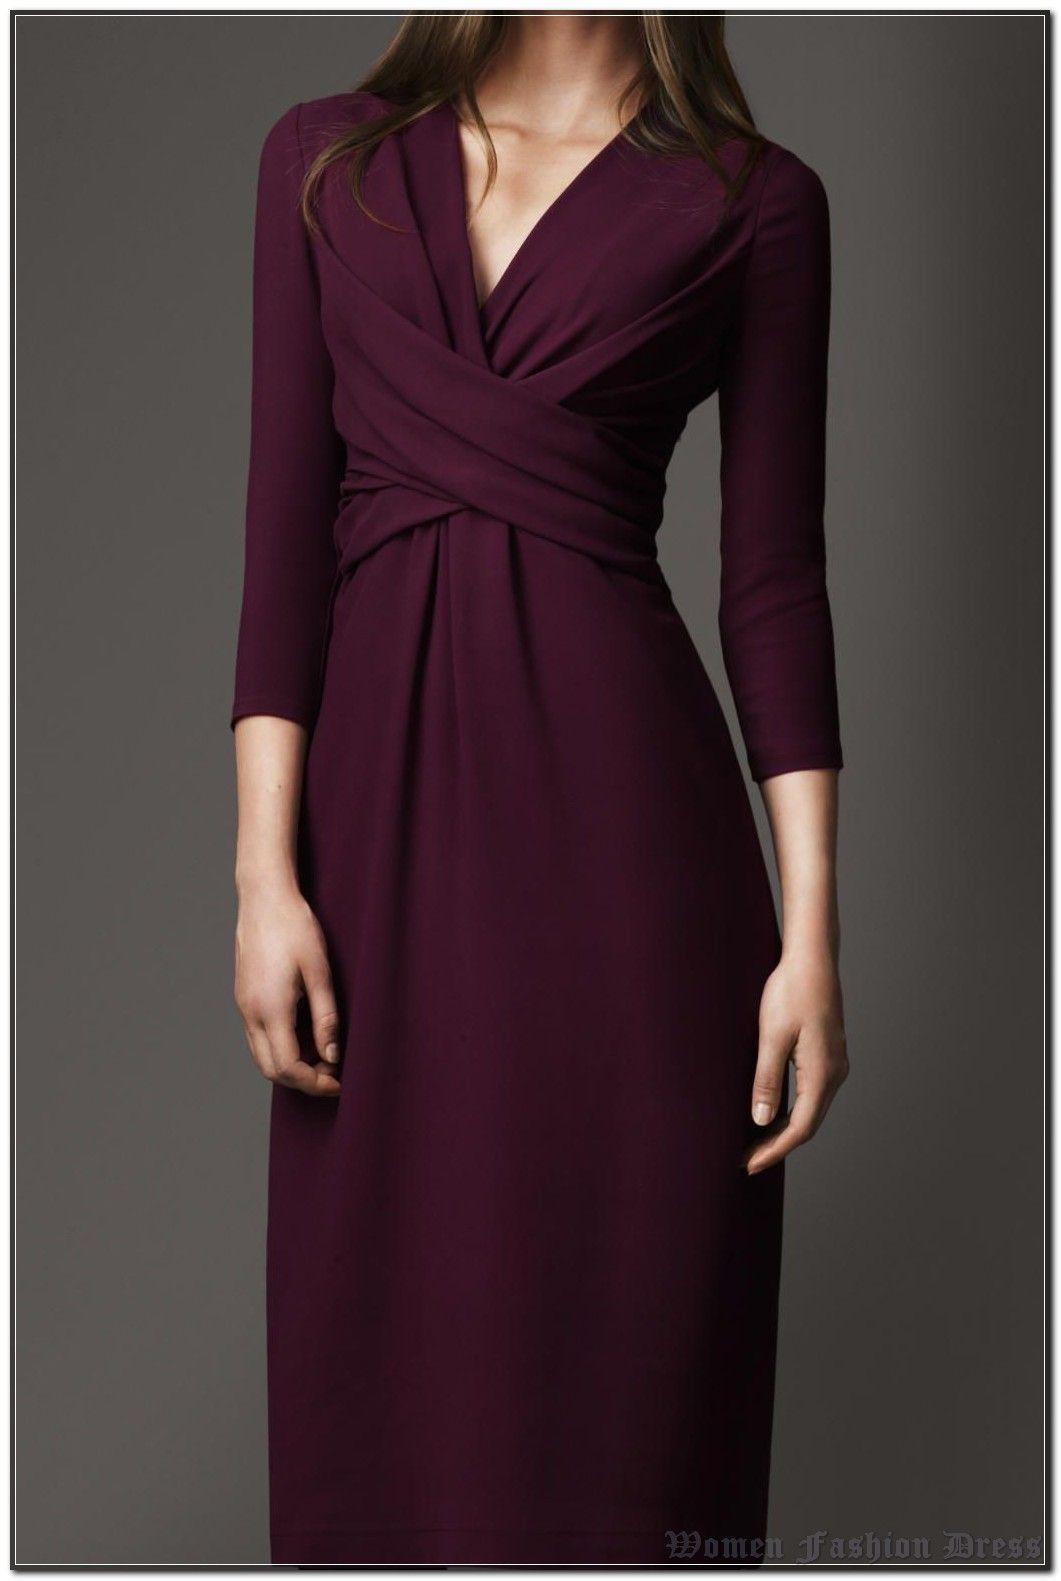 5 Proven Women Fashion Dress Techniques